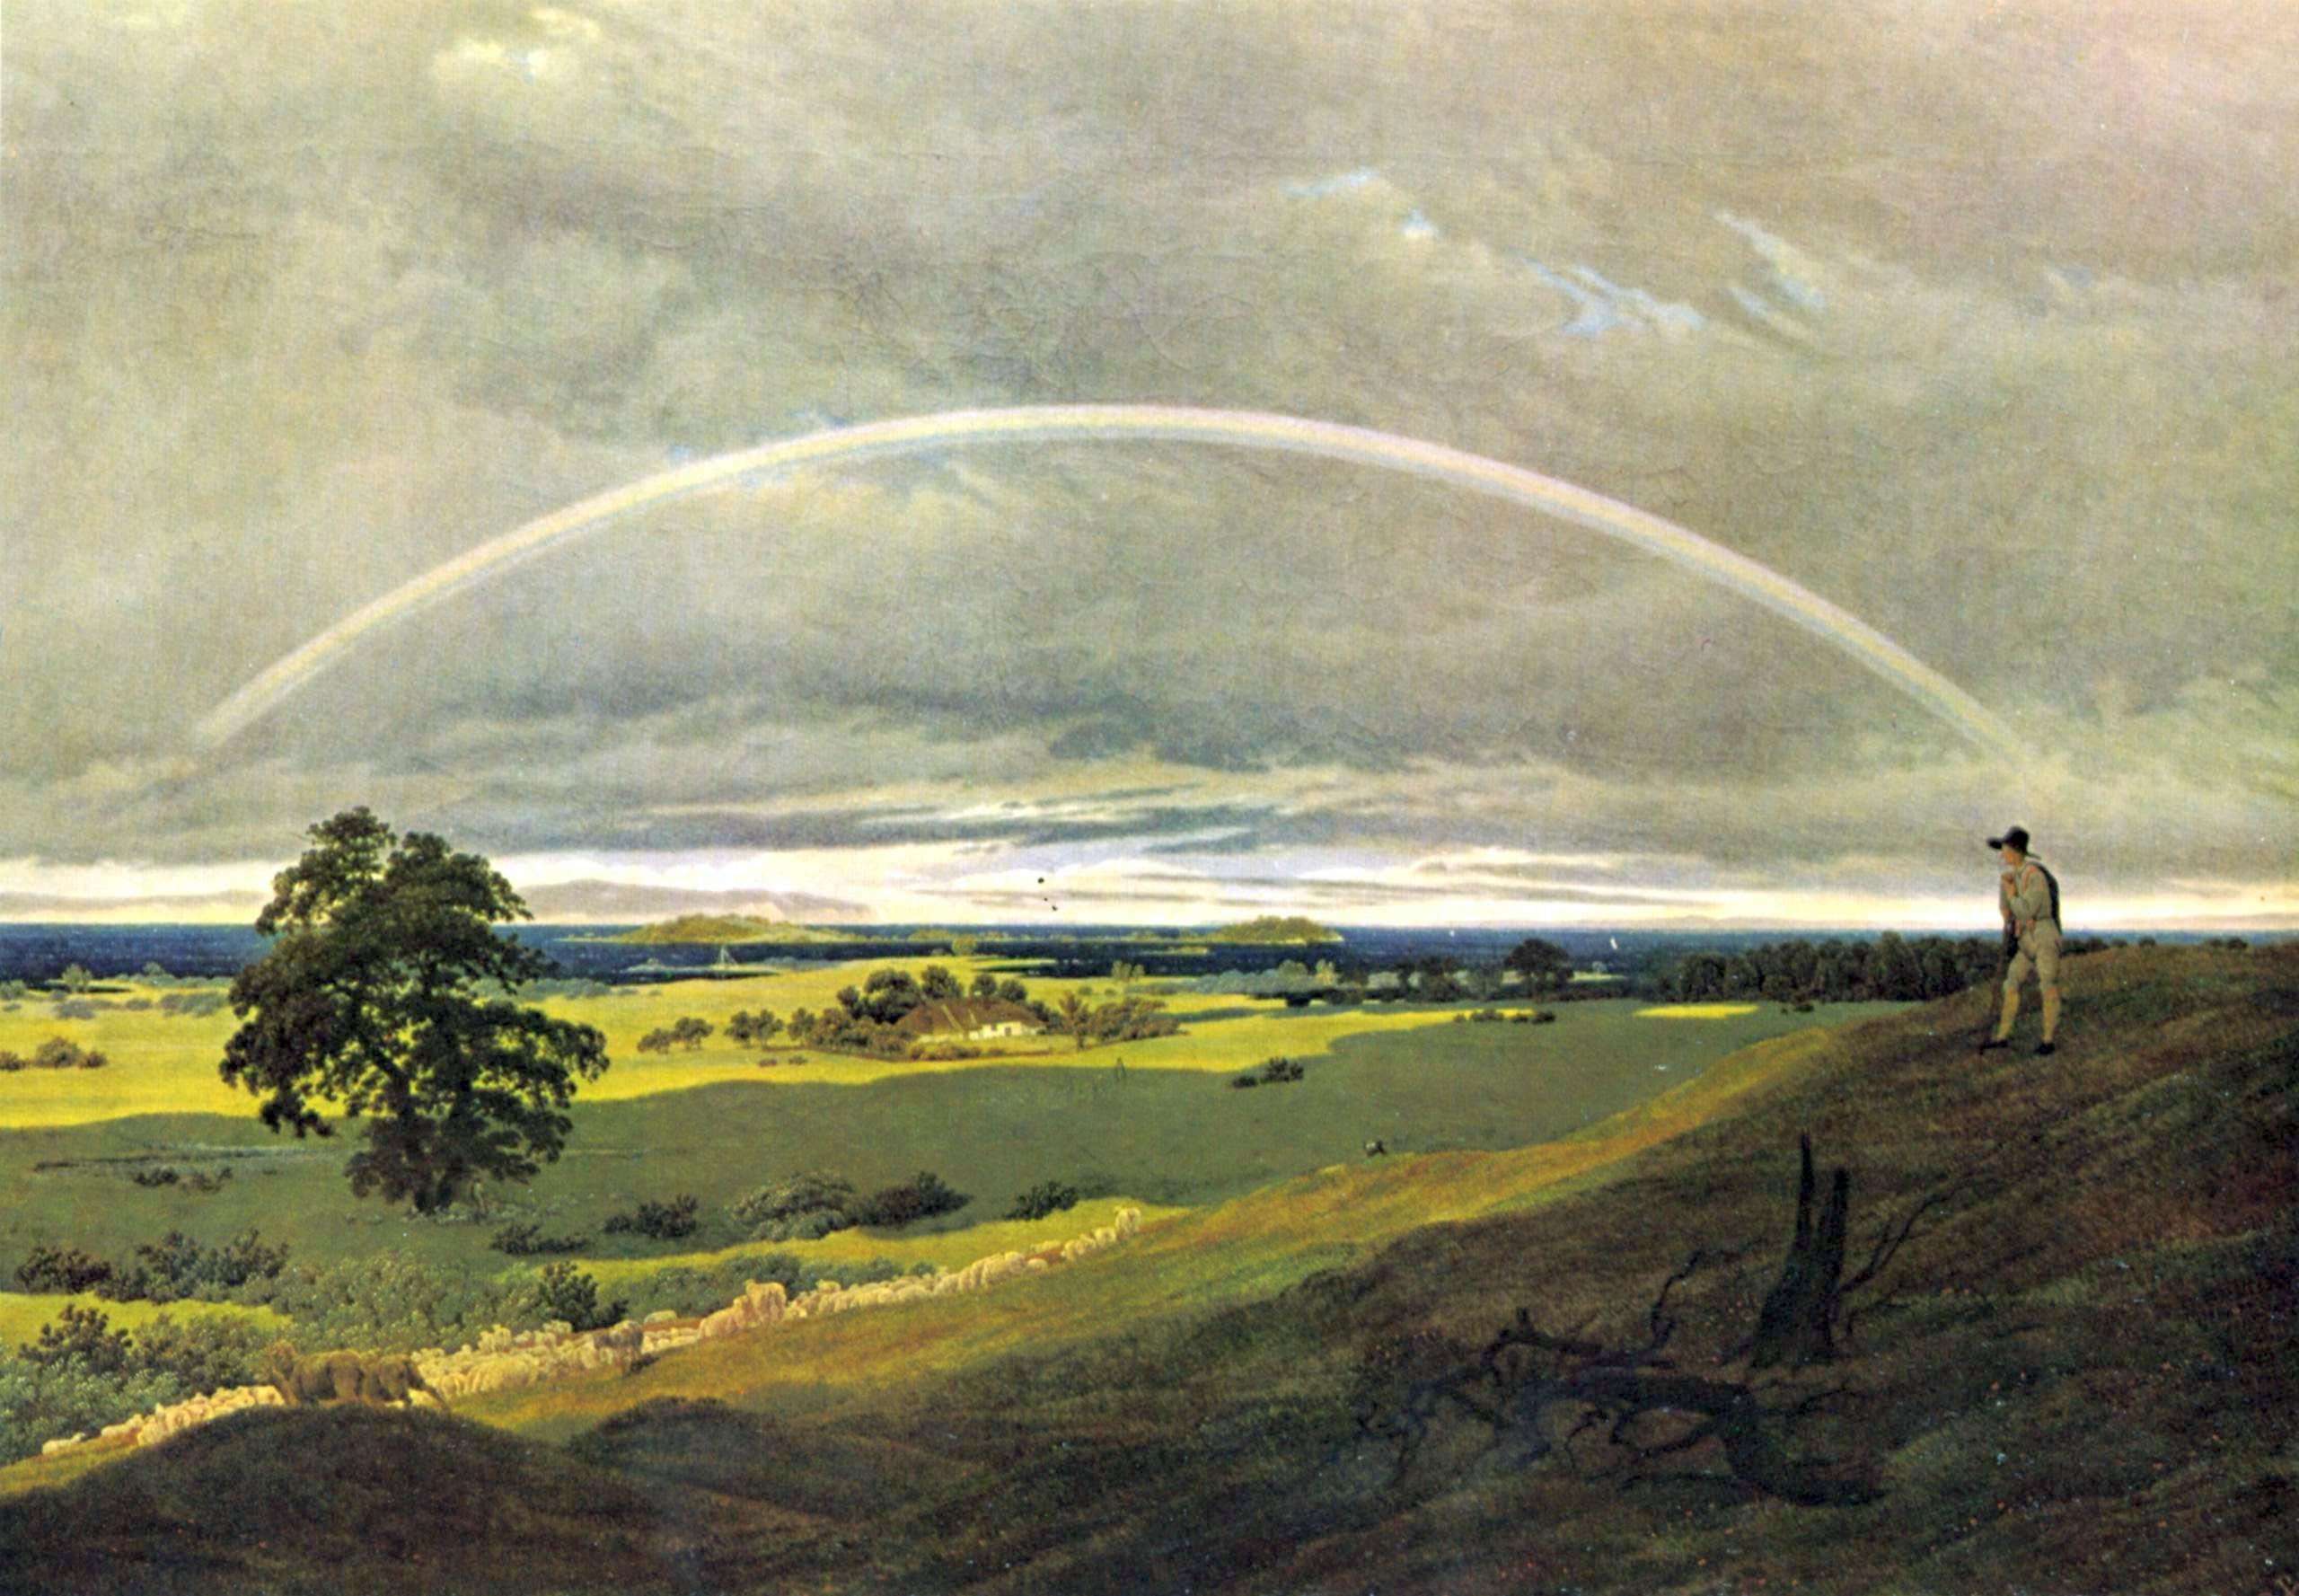 Landschaftsmalerei romantik friedrich  Gebirgslandschaft mit Regenbogen – Wikipedia